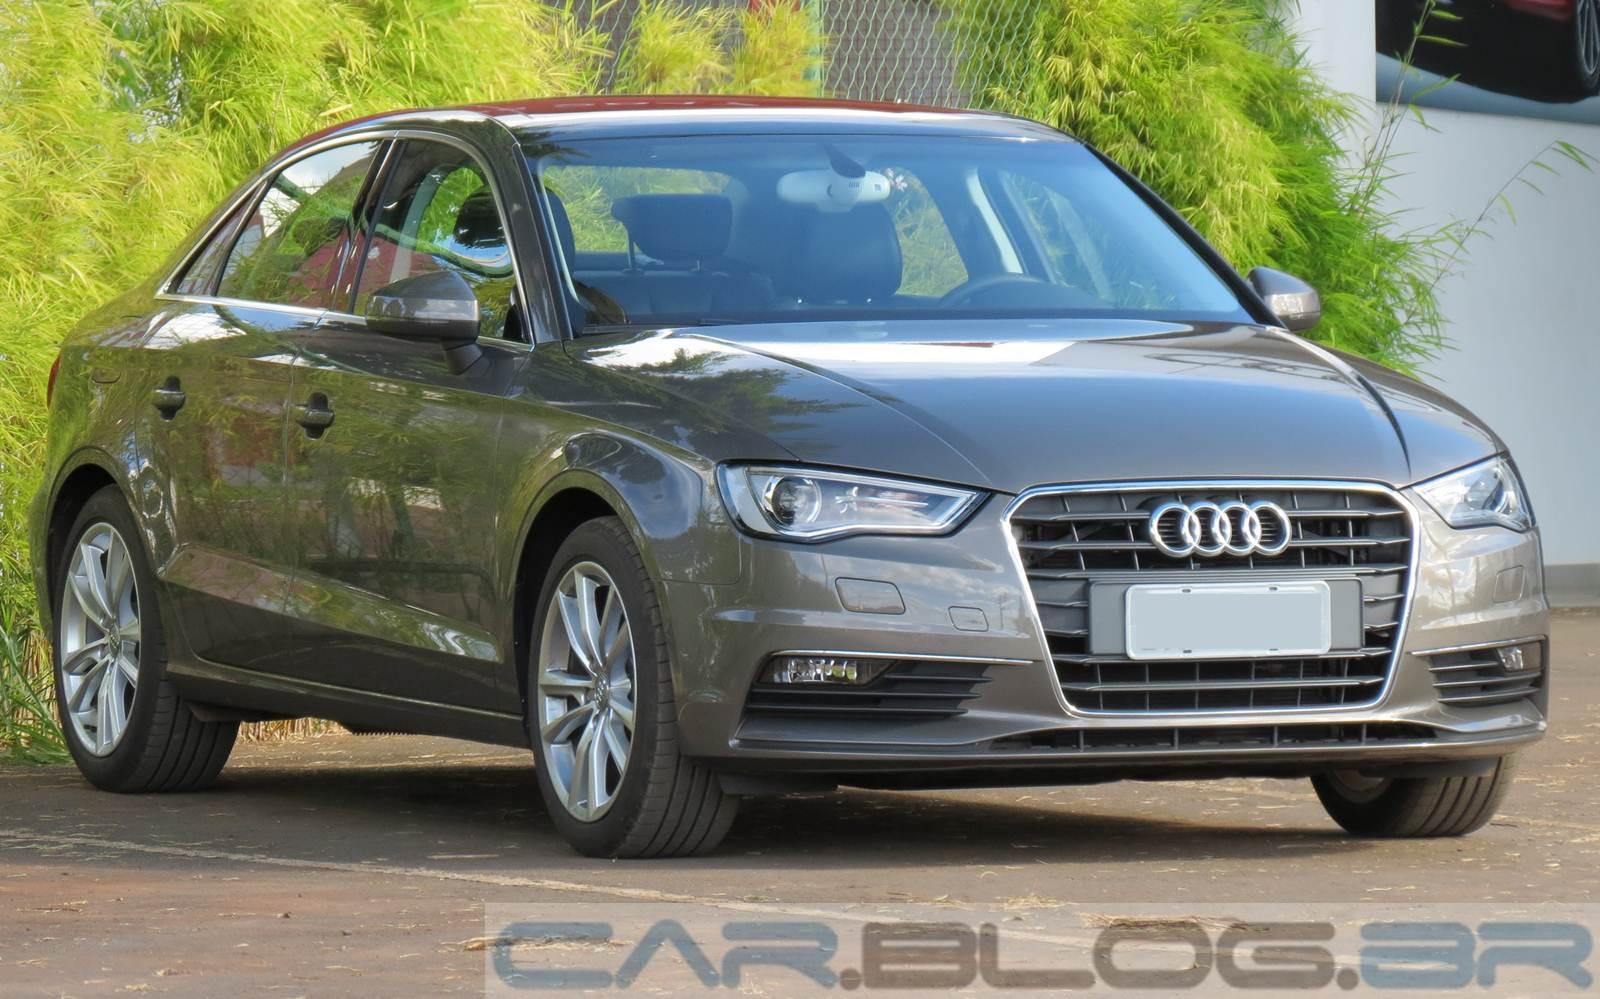 Audi A3 Sedan 1.8T Ambition